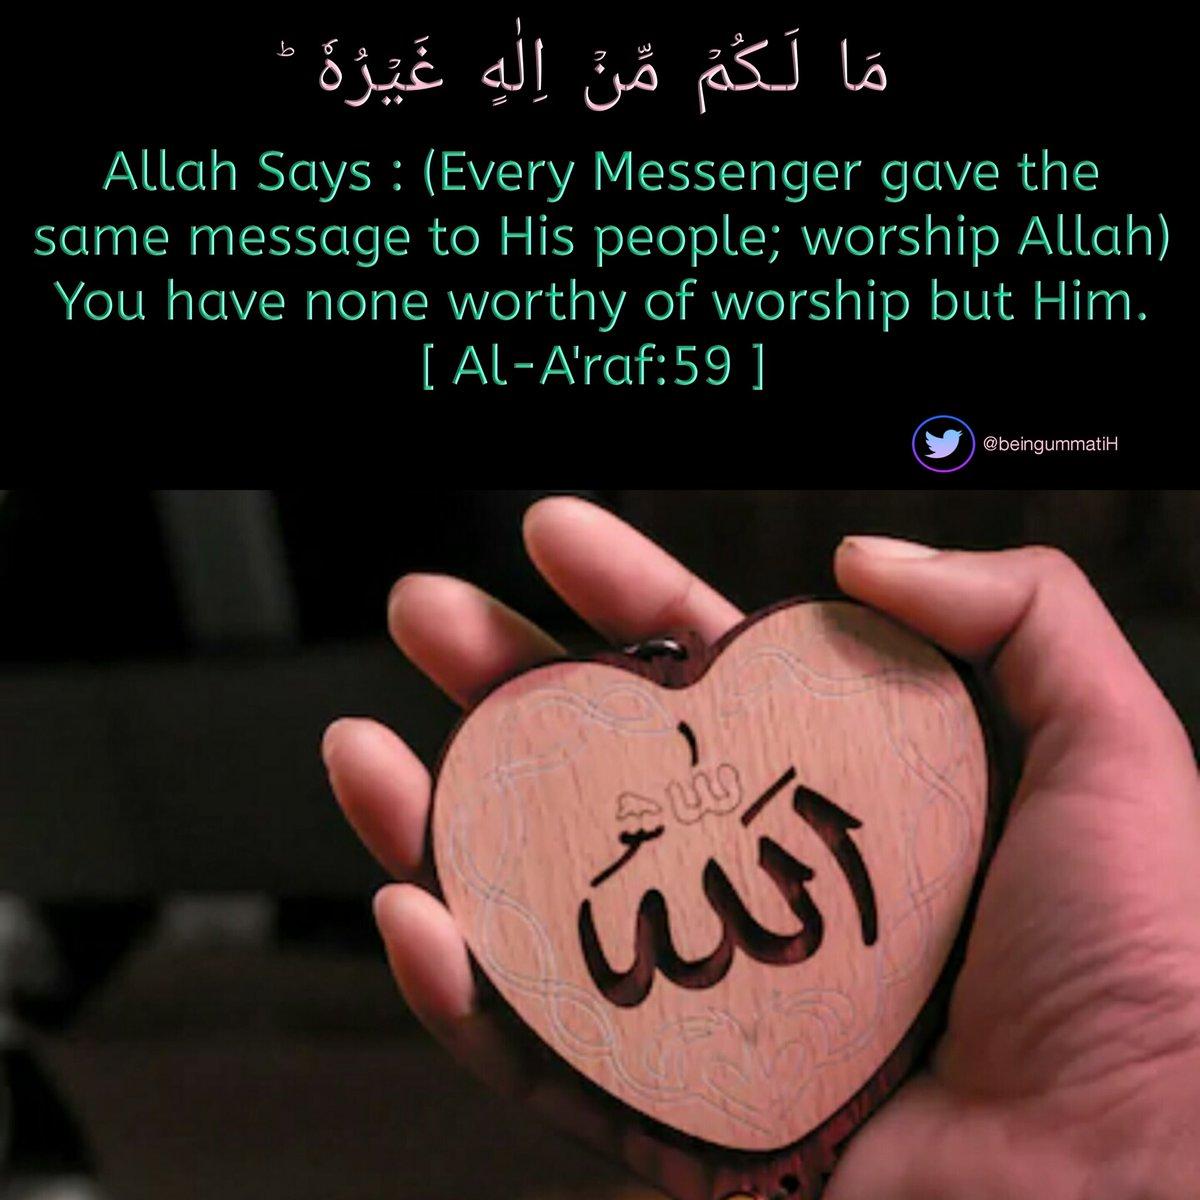 #muslimah #muslim #islamicquotes #islamic #islam #qoutes #qoutesoftheday #bikinrame #memeinajah #memecomicindonesia #raffinagita1717 #pathindonesia #poetry #poem #dagelanjowo #dagelan #ngakakkocak #rajangakak #dagelanindo #guyonann #guyonan #ayutingting #suamiistribahagiapic.twitter.com/5py9vcBCLn